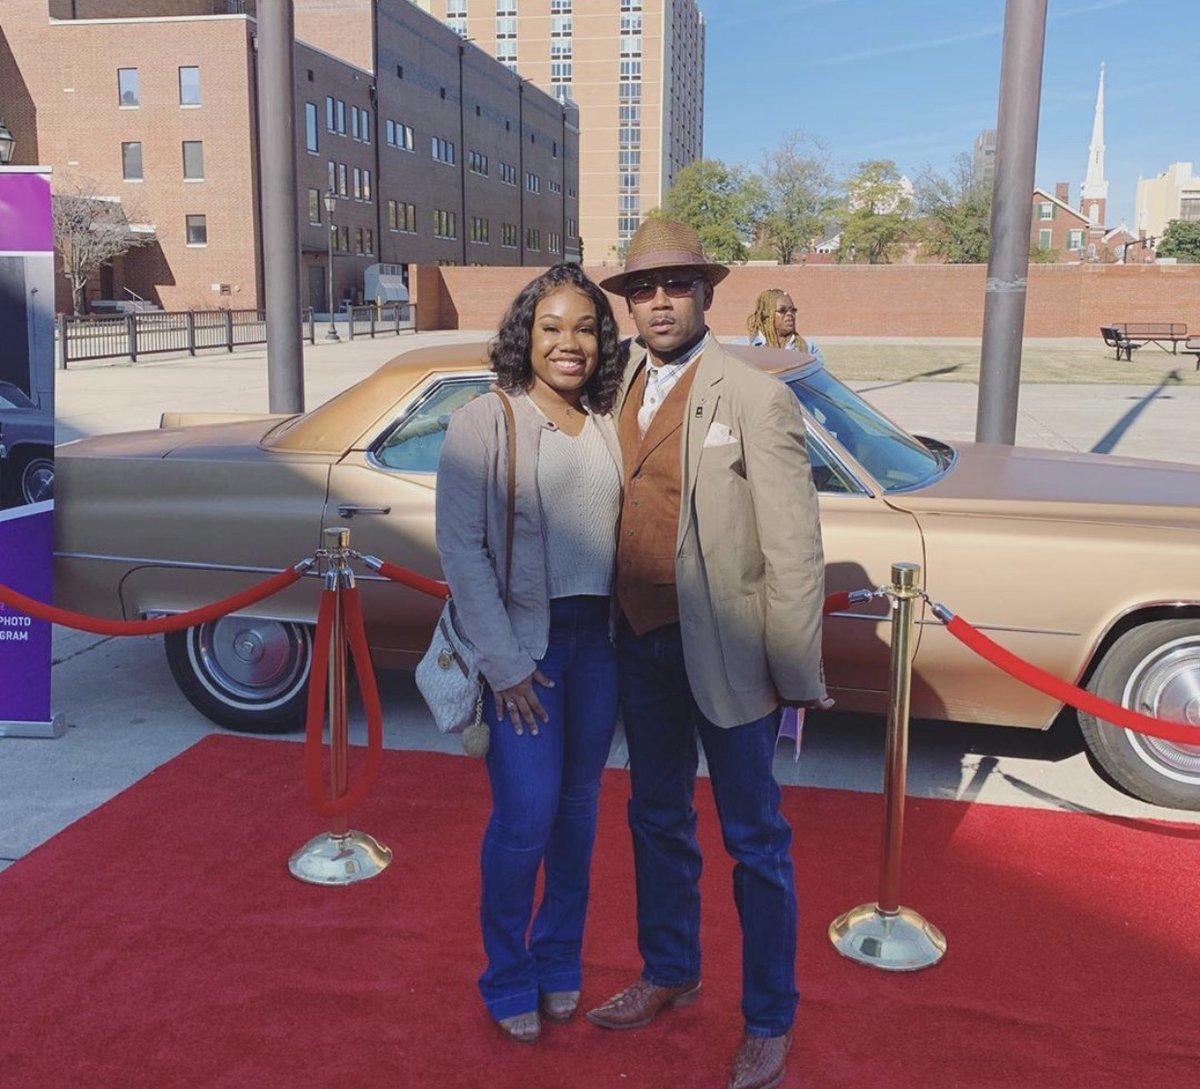 Madea's Cadillac Photo Features! #allrightnow #MadeasFarewellTour #JamesBrownArena #AugustaGApic.twitter.com/q7dFmlLfcM